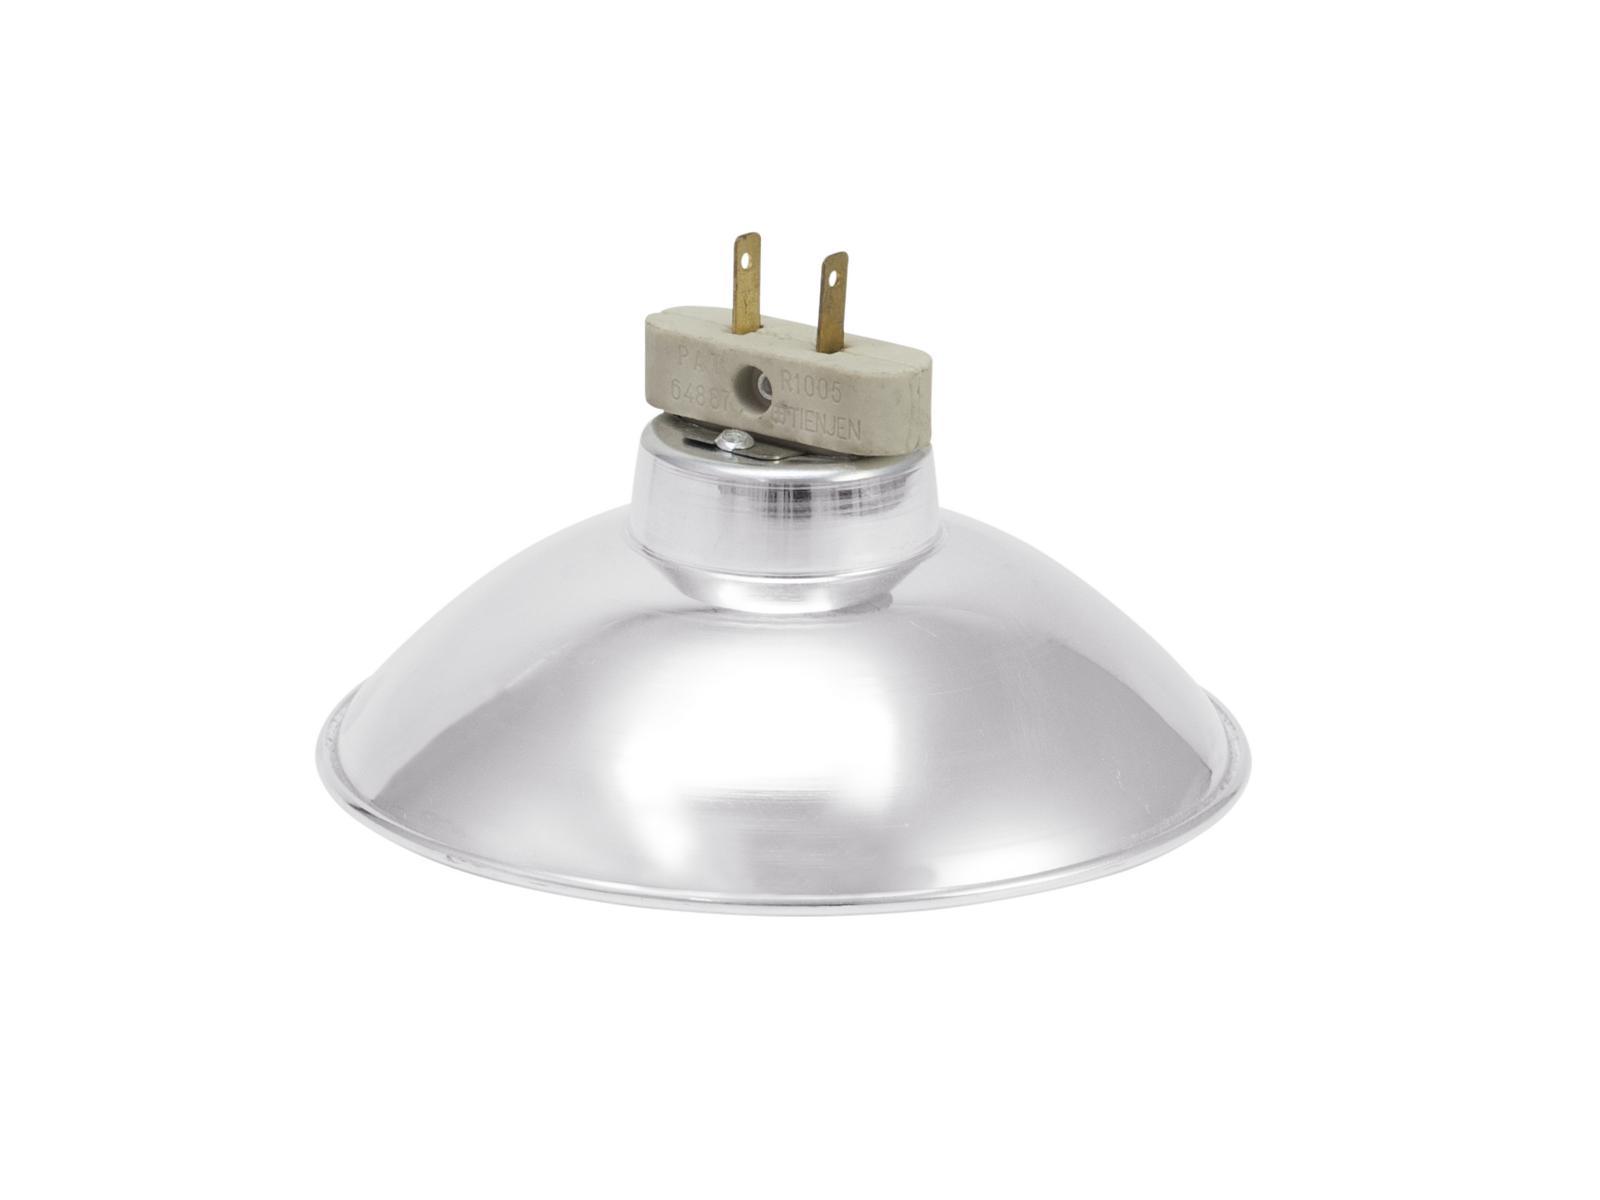 EUROLITE porta lampada PAR-46 GY-9.5